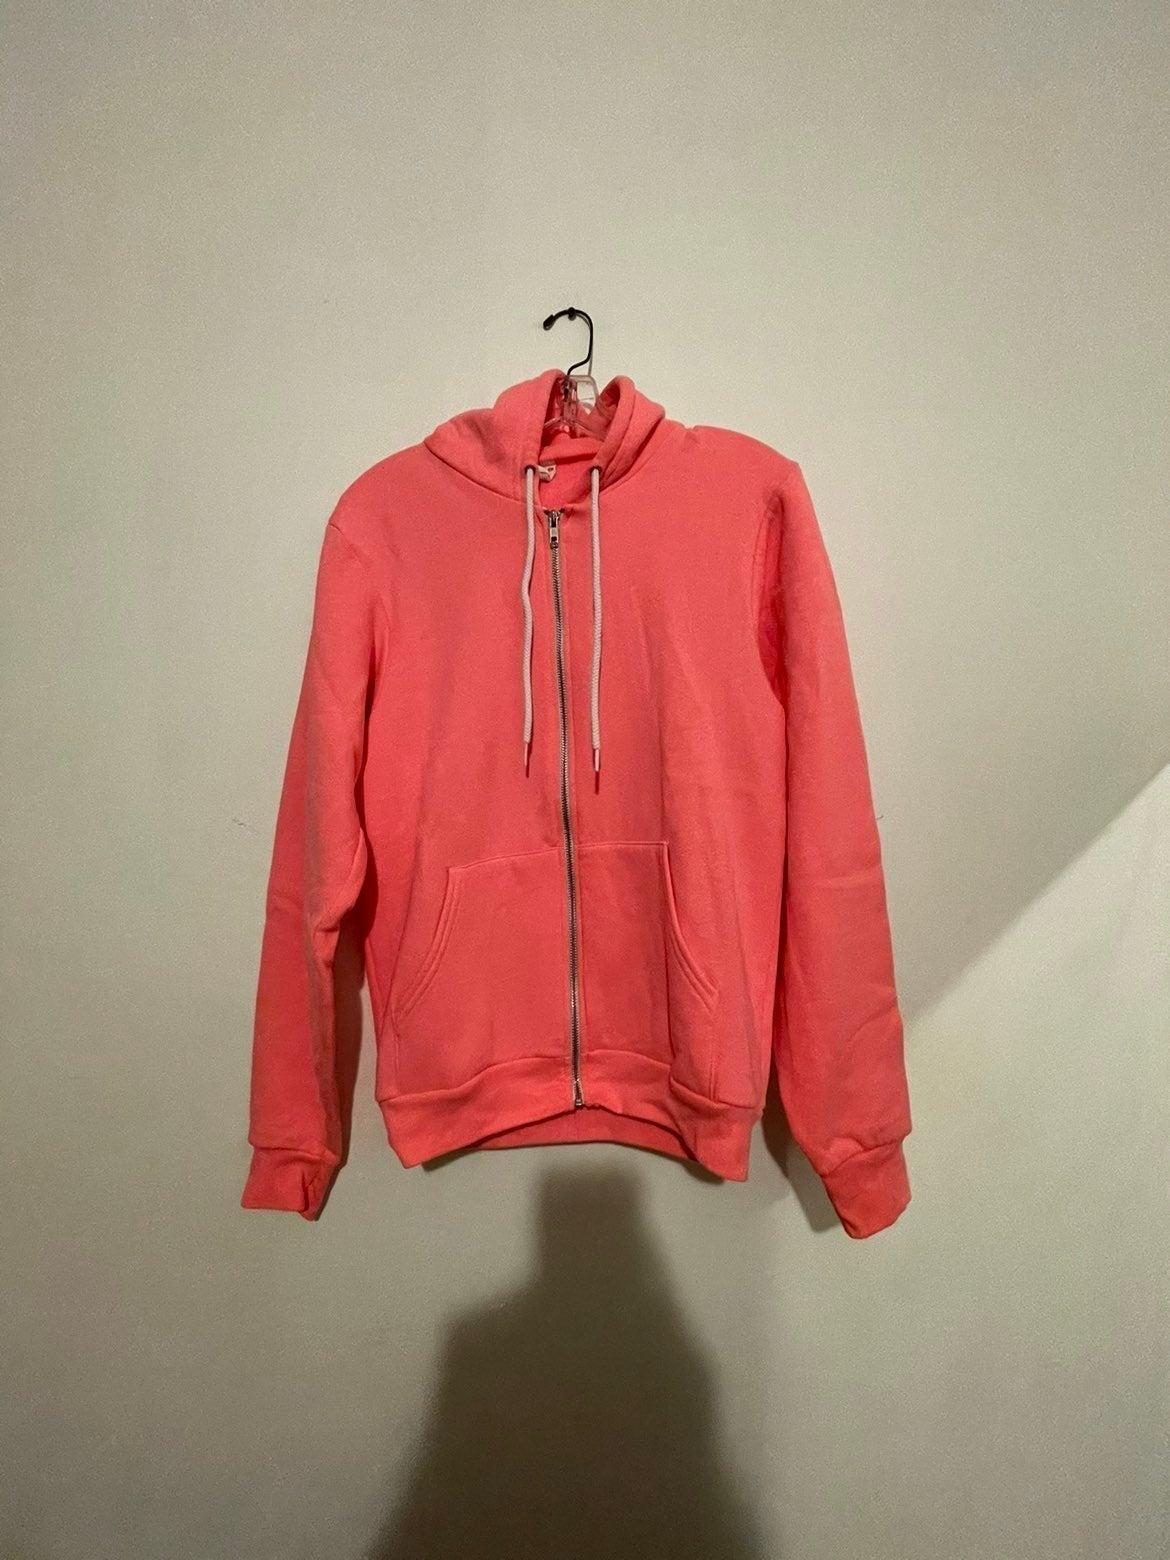 American ApparelNeon pink sweater